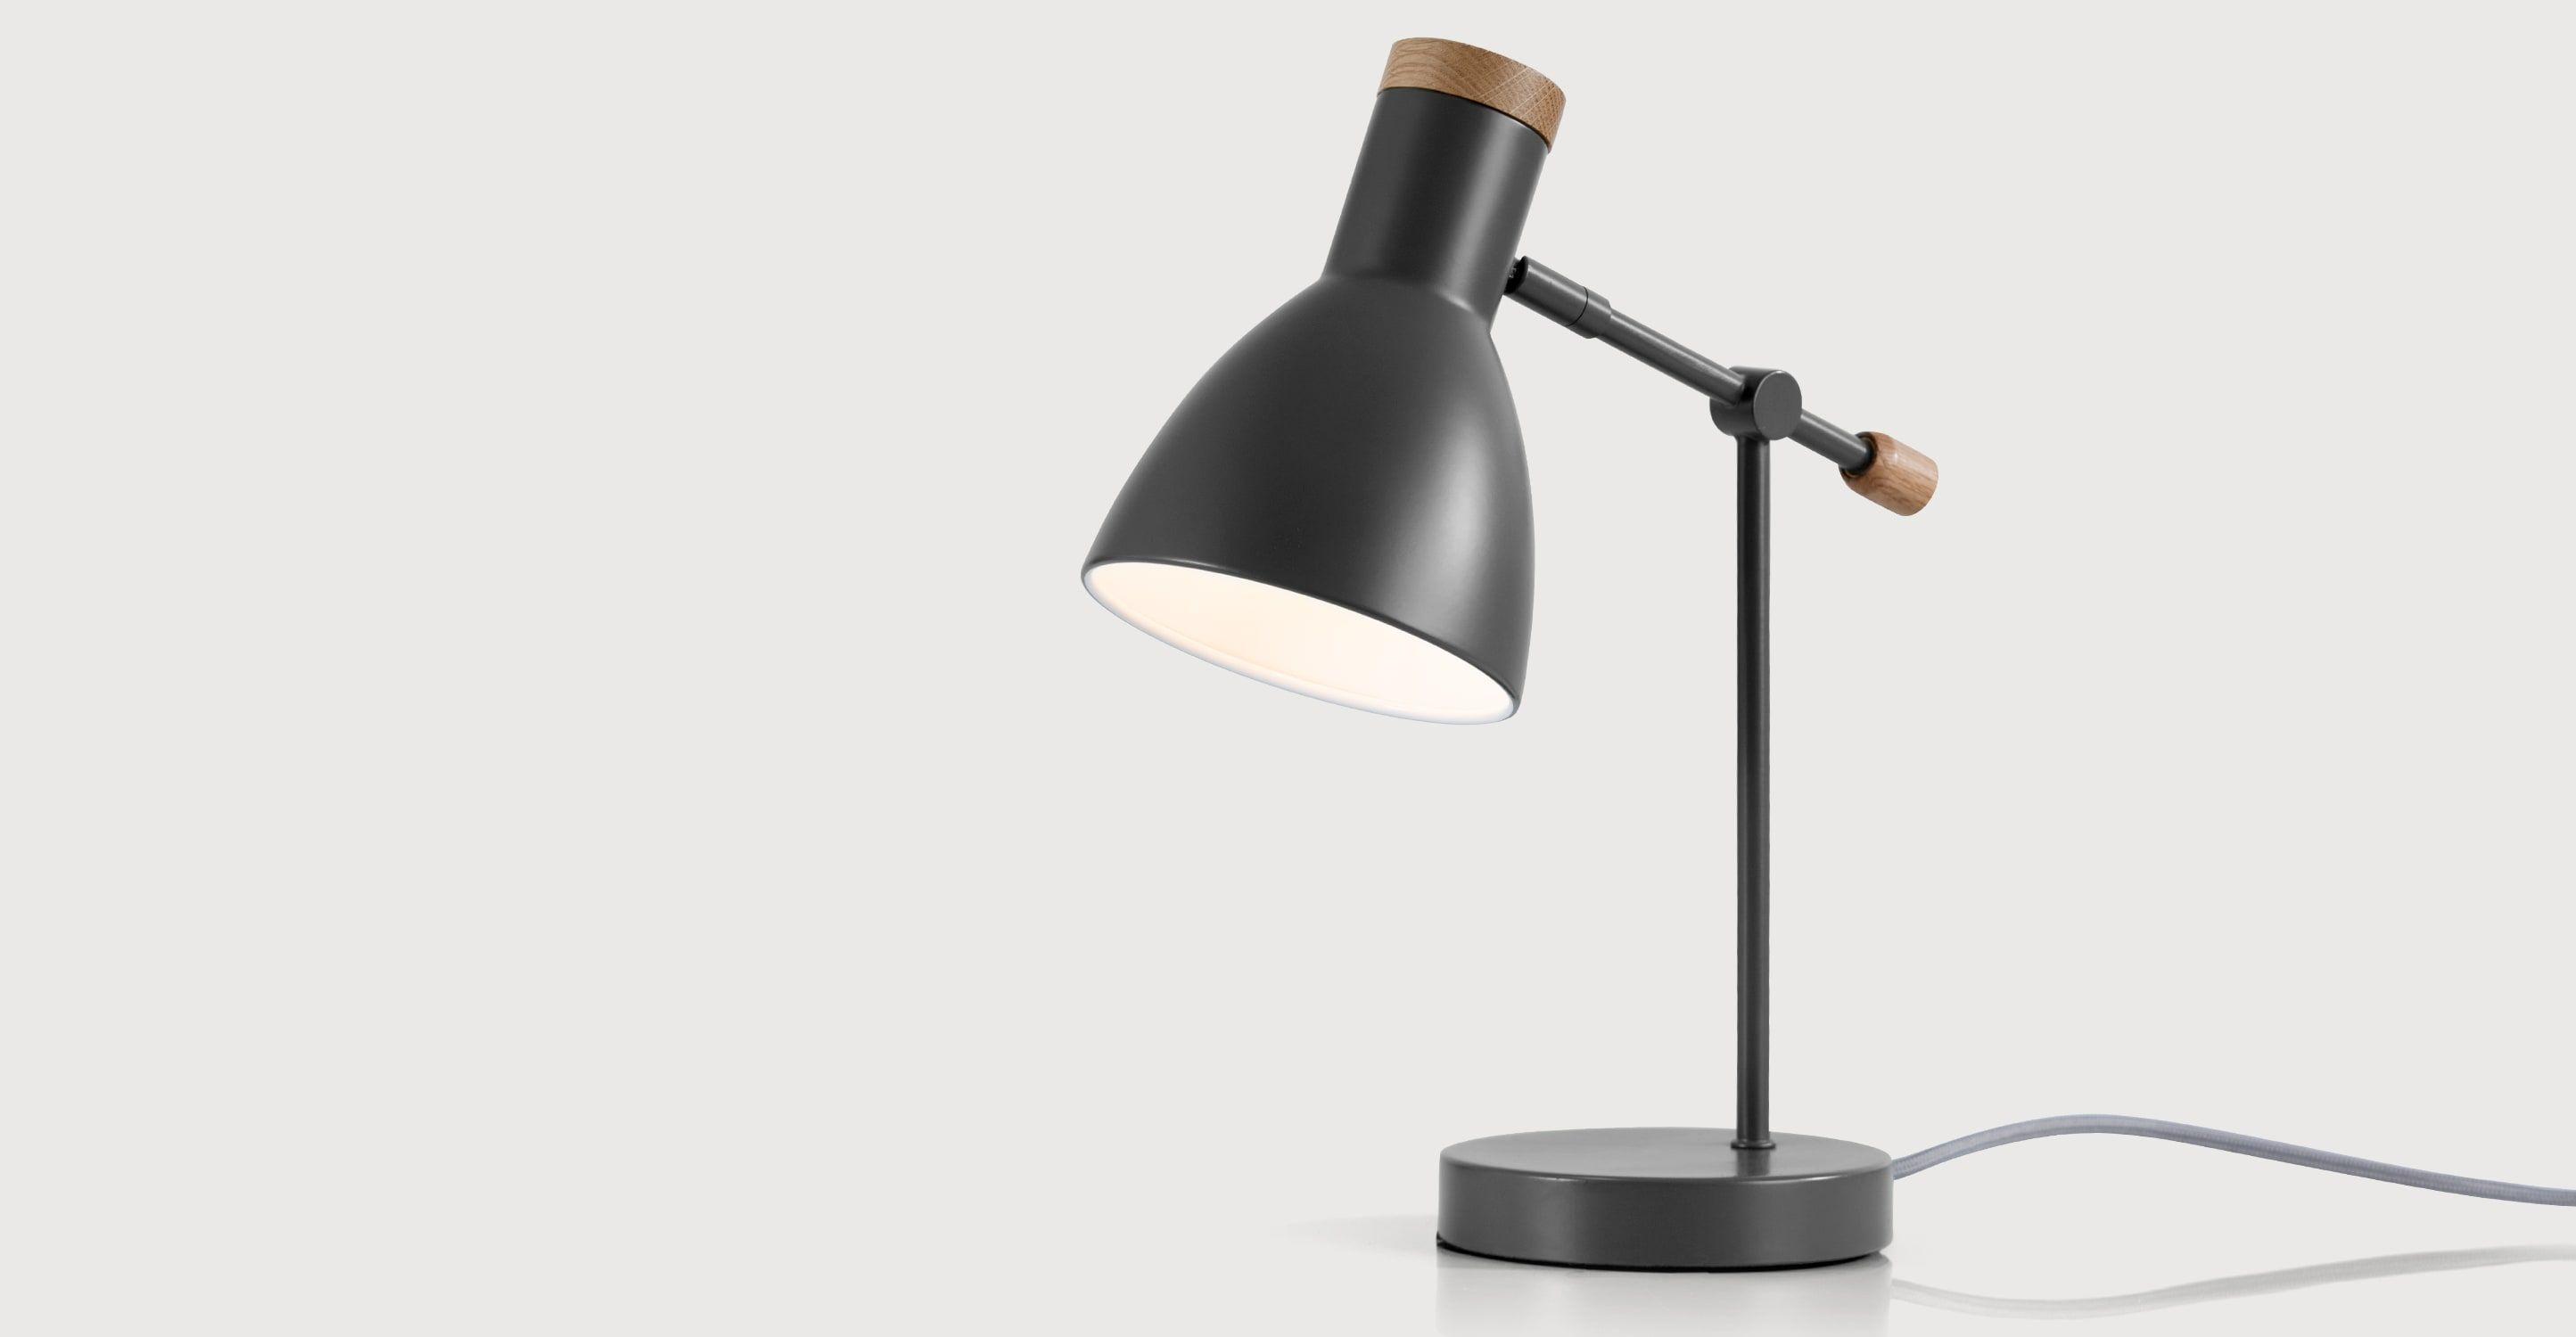 Lamp Slaapkamer Nachtkastje : Cohen nachtkast lampje diepgrijs en amerikaanse eik verlichting